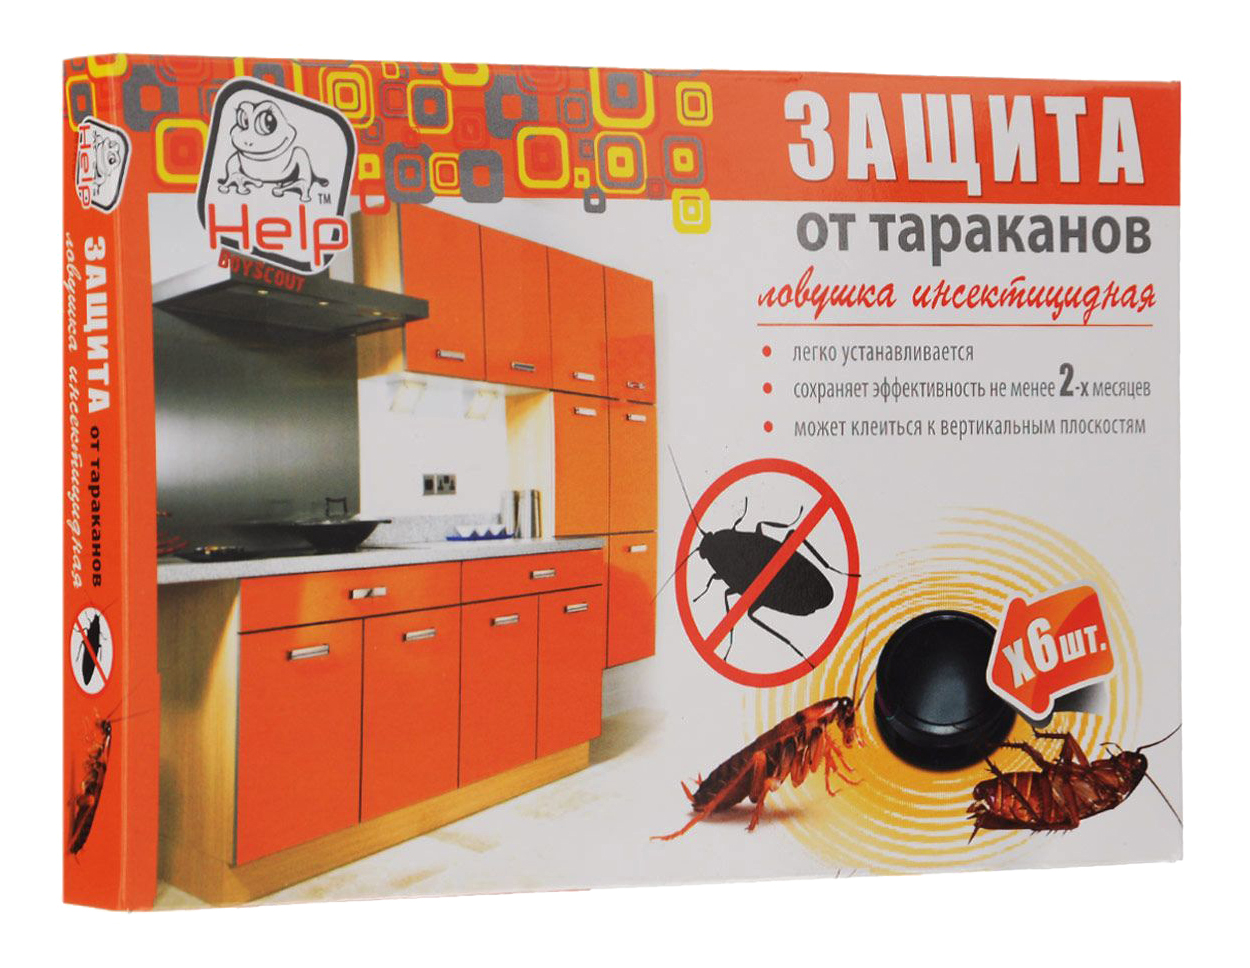 Ловушка Help для тараканов 6 штук